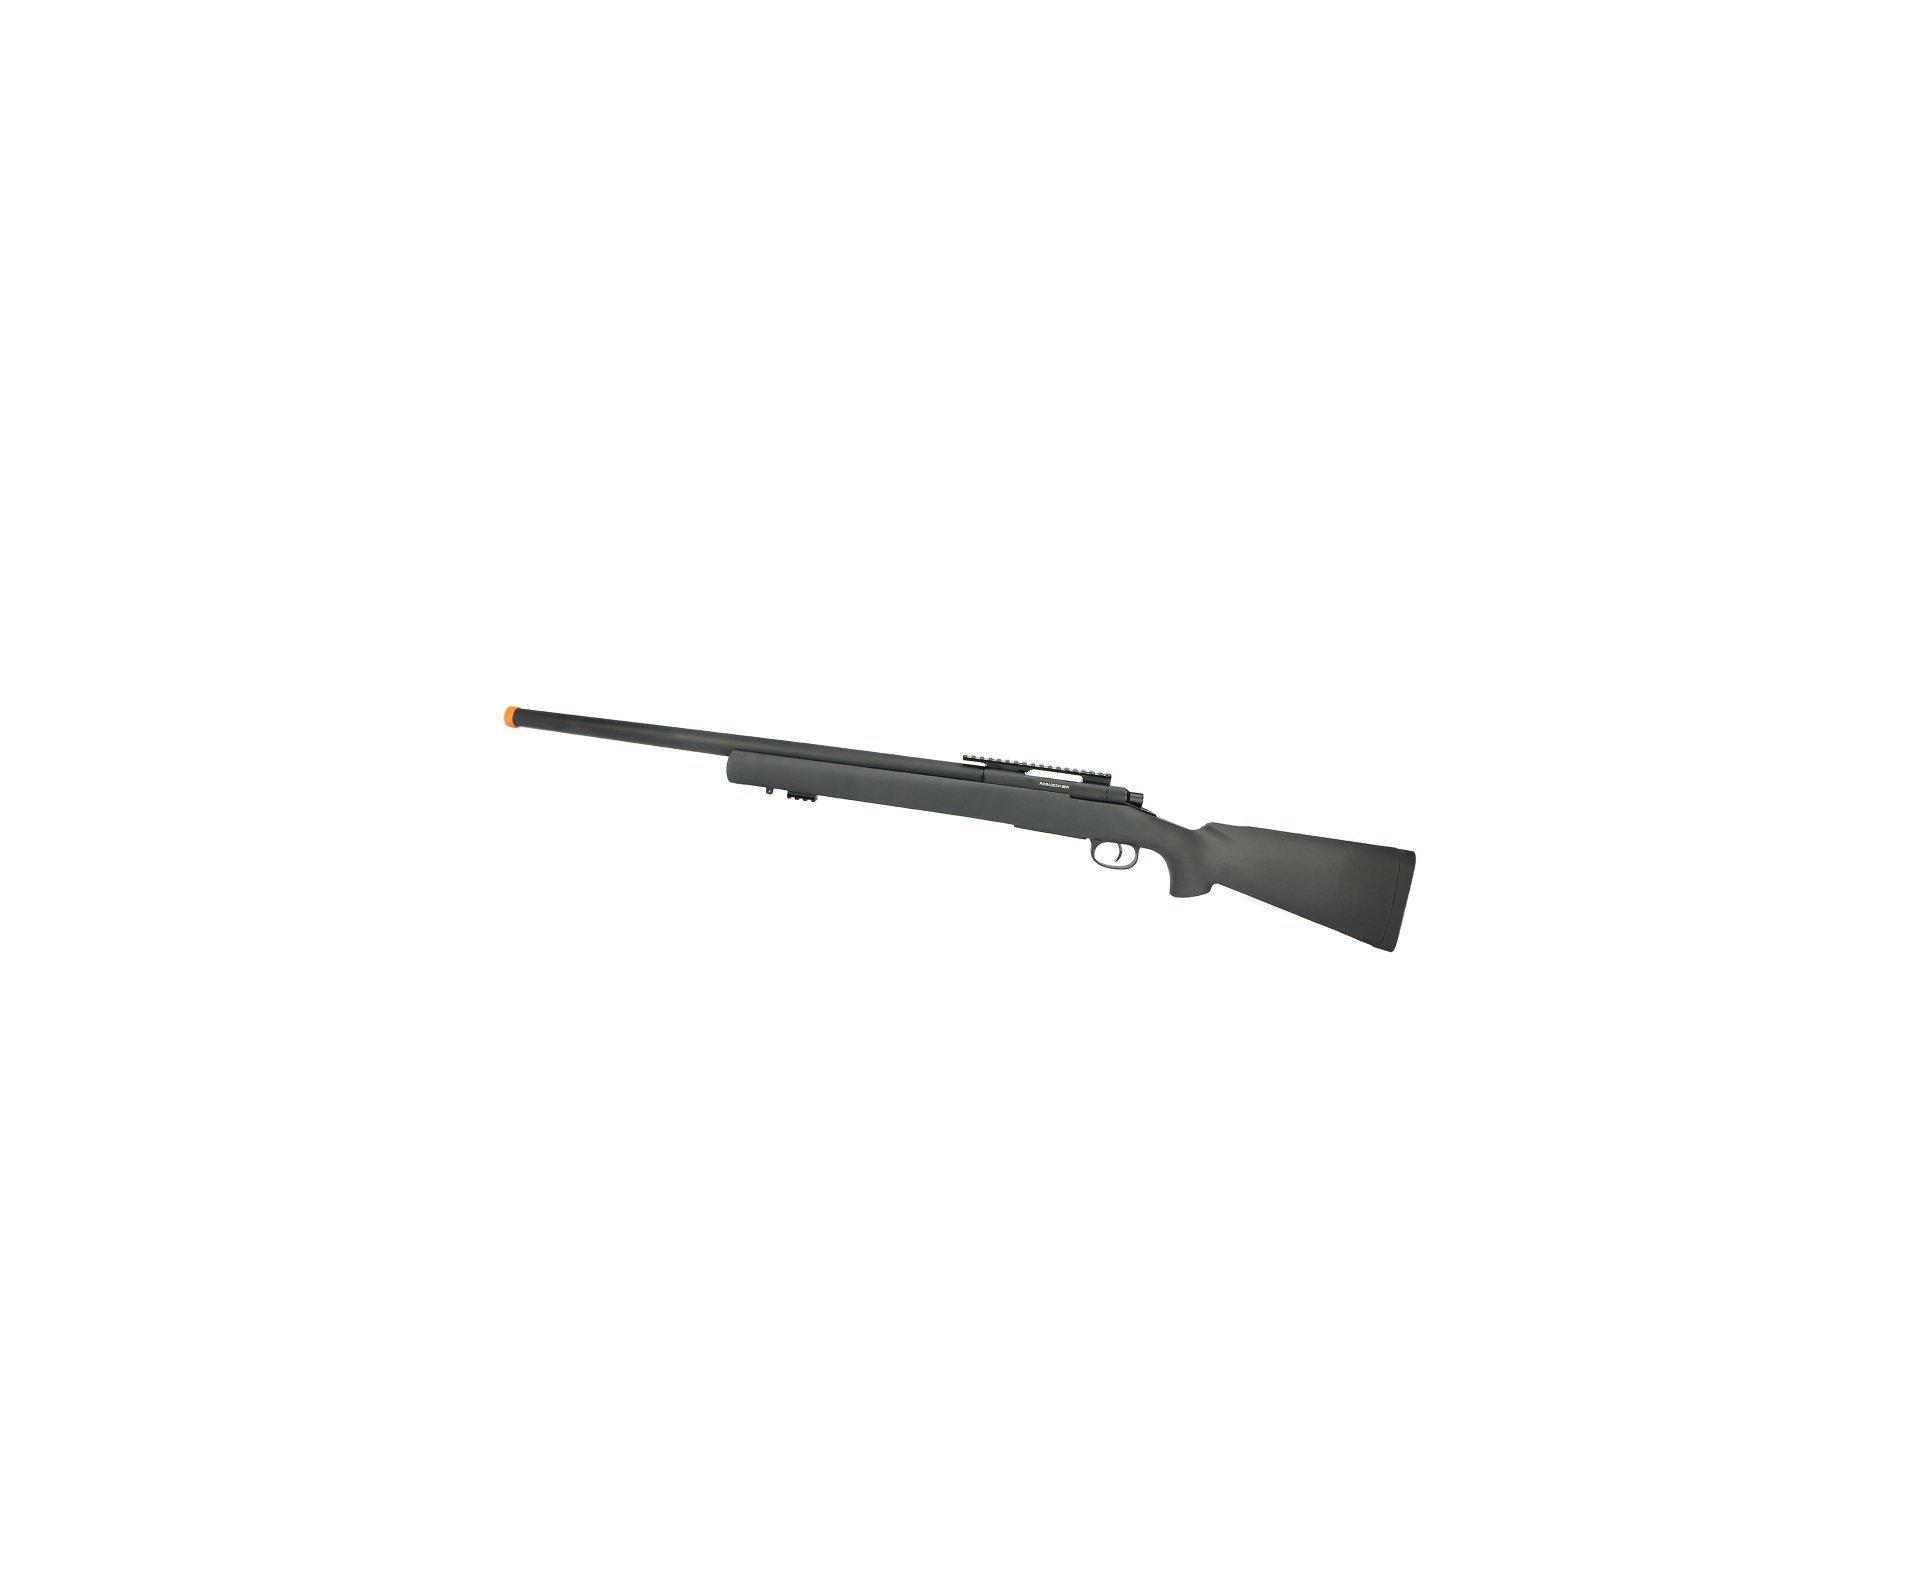 Rifle De Airsoft Sniper M24 Storm Full Metal Vsr10 Spring 6mm - Rossi + 4000 Bbs Raptor Sniper 0,30g